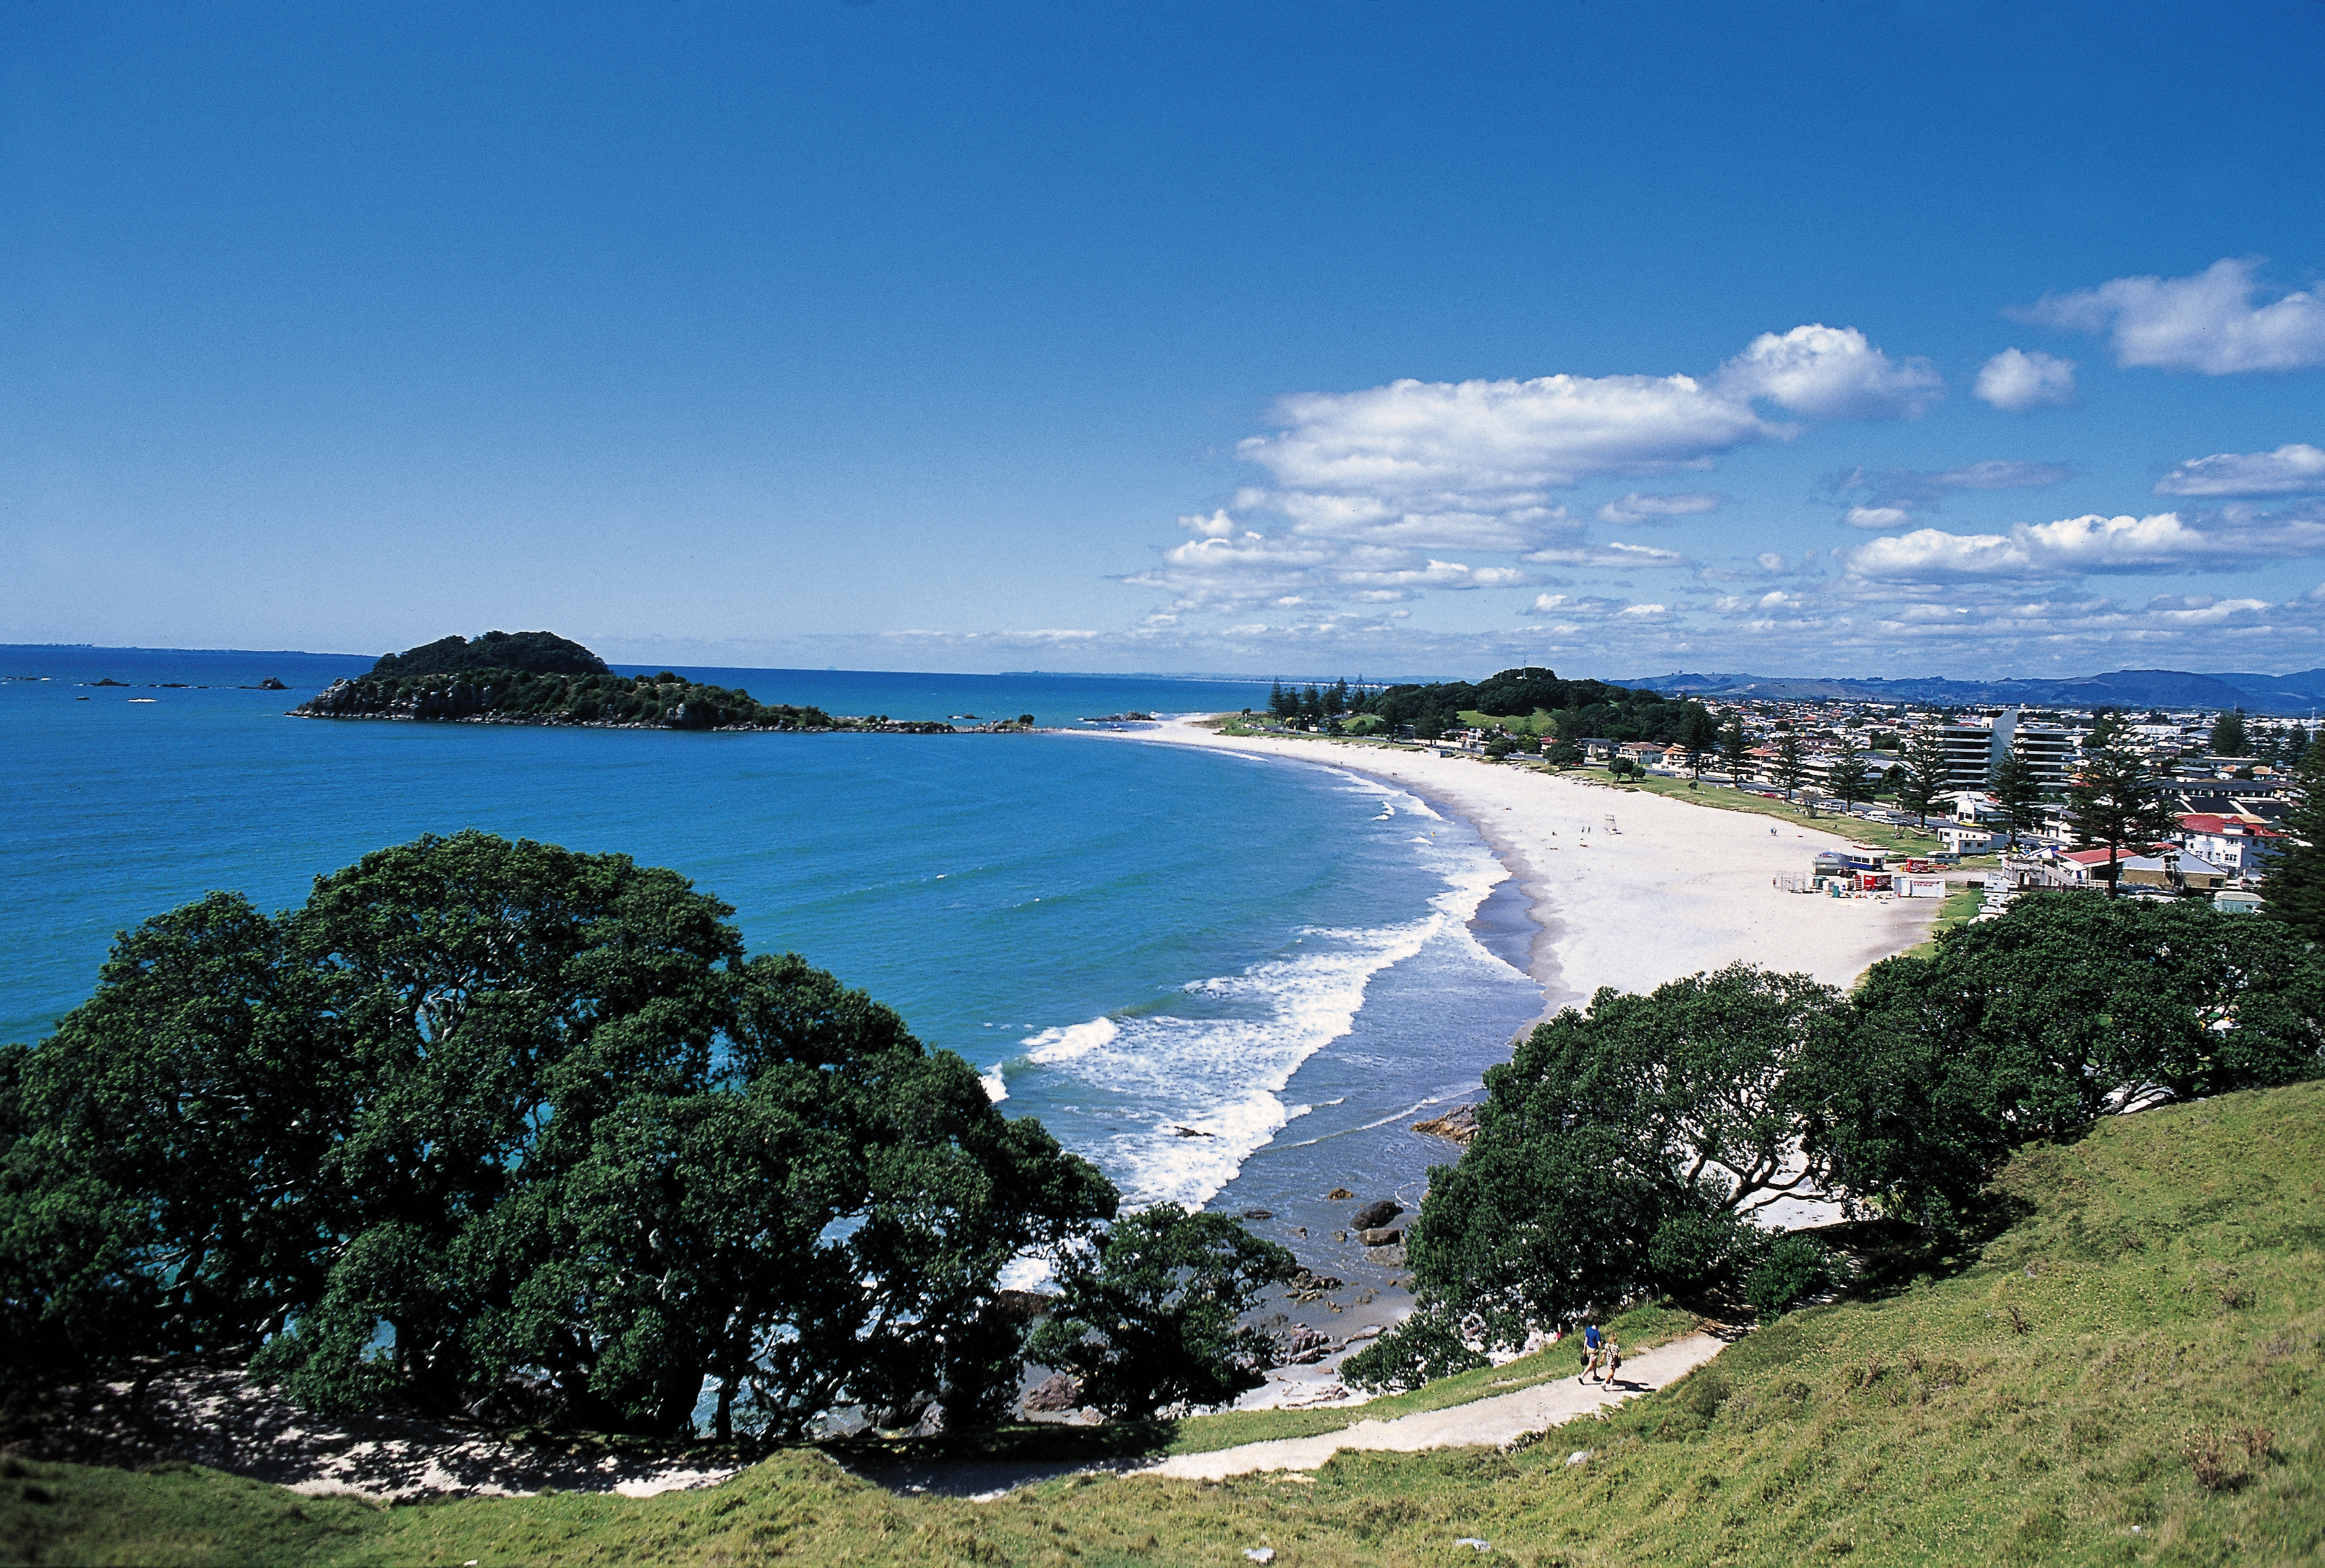 Omanui beach, Tauranga, Bay of Plenty, North island, New Zealand, Feb. 9.